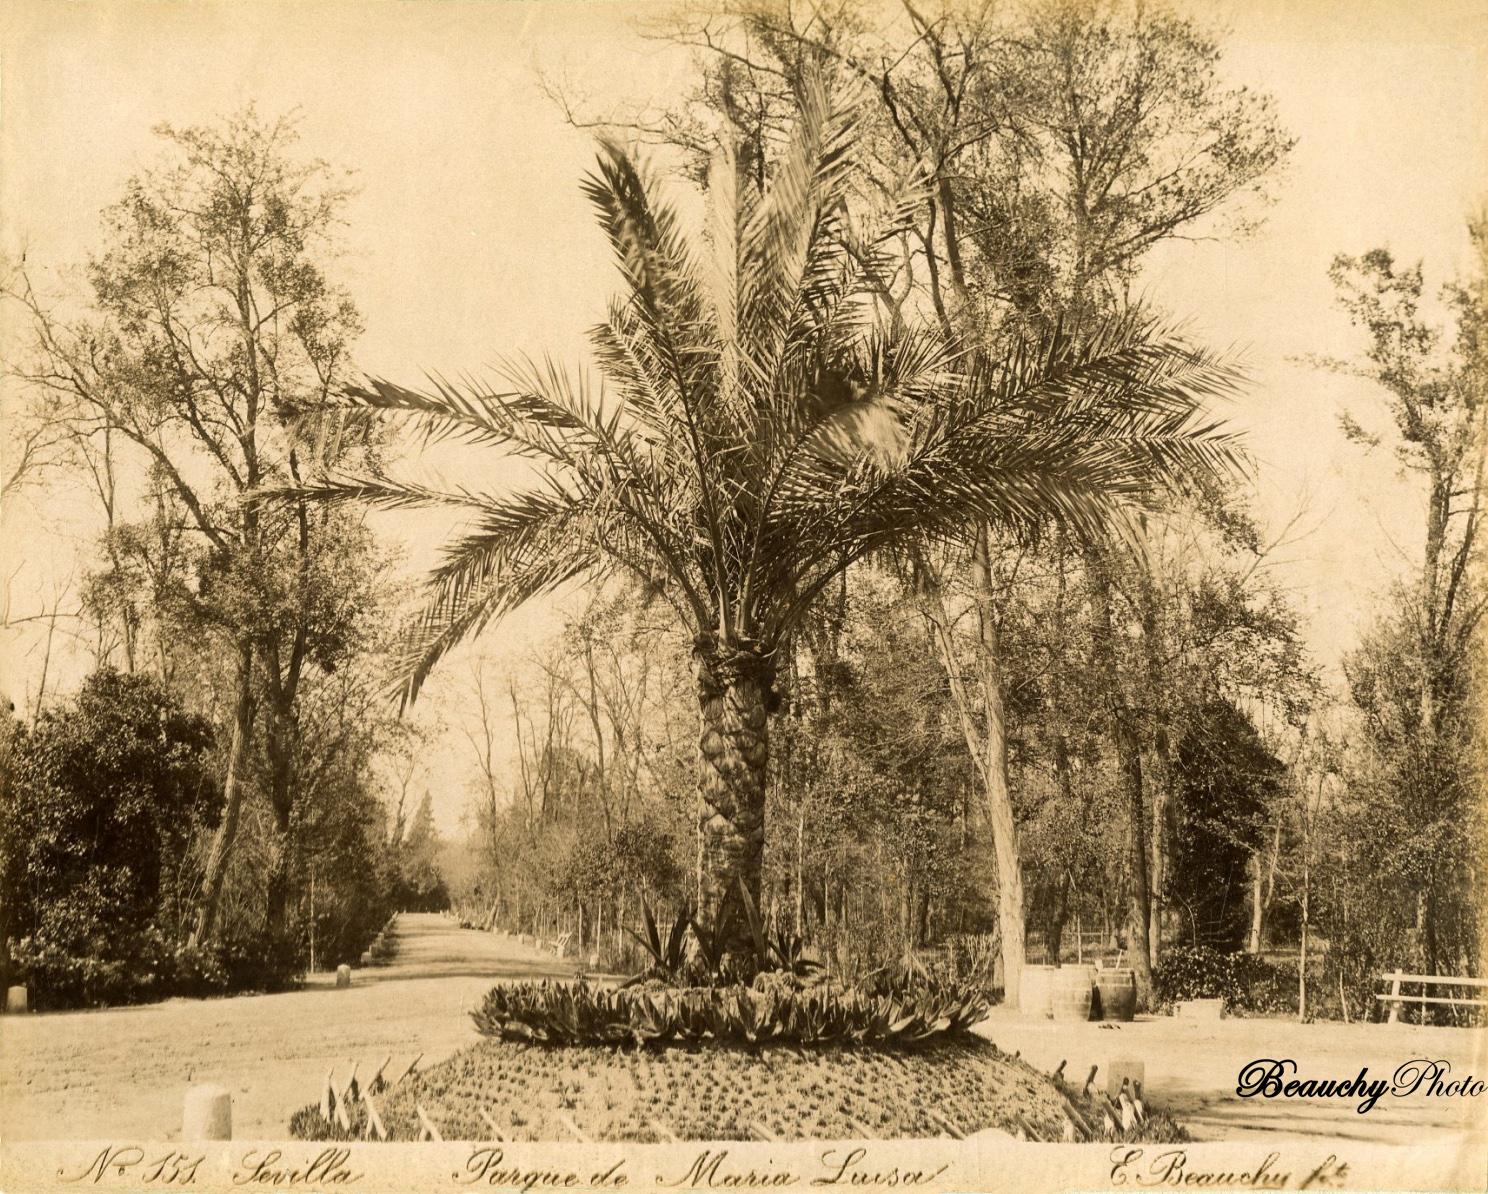 Beauchyphoto_Parque_de_Maria_Luisa_c.1880_Emilio_Beauchy_Cano_fotografias_antiguas_postales_vistas_y_monumentos